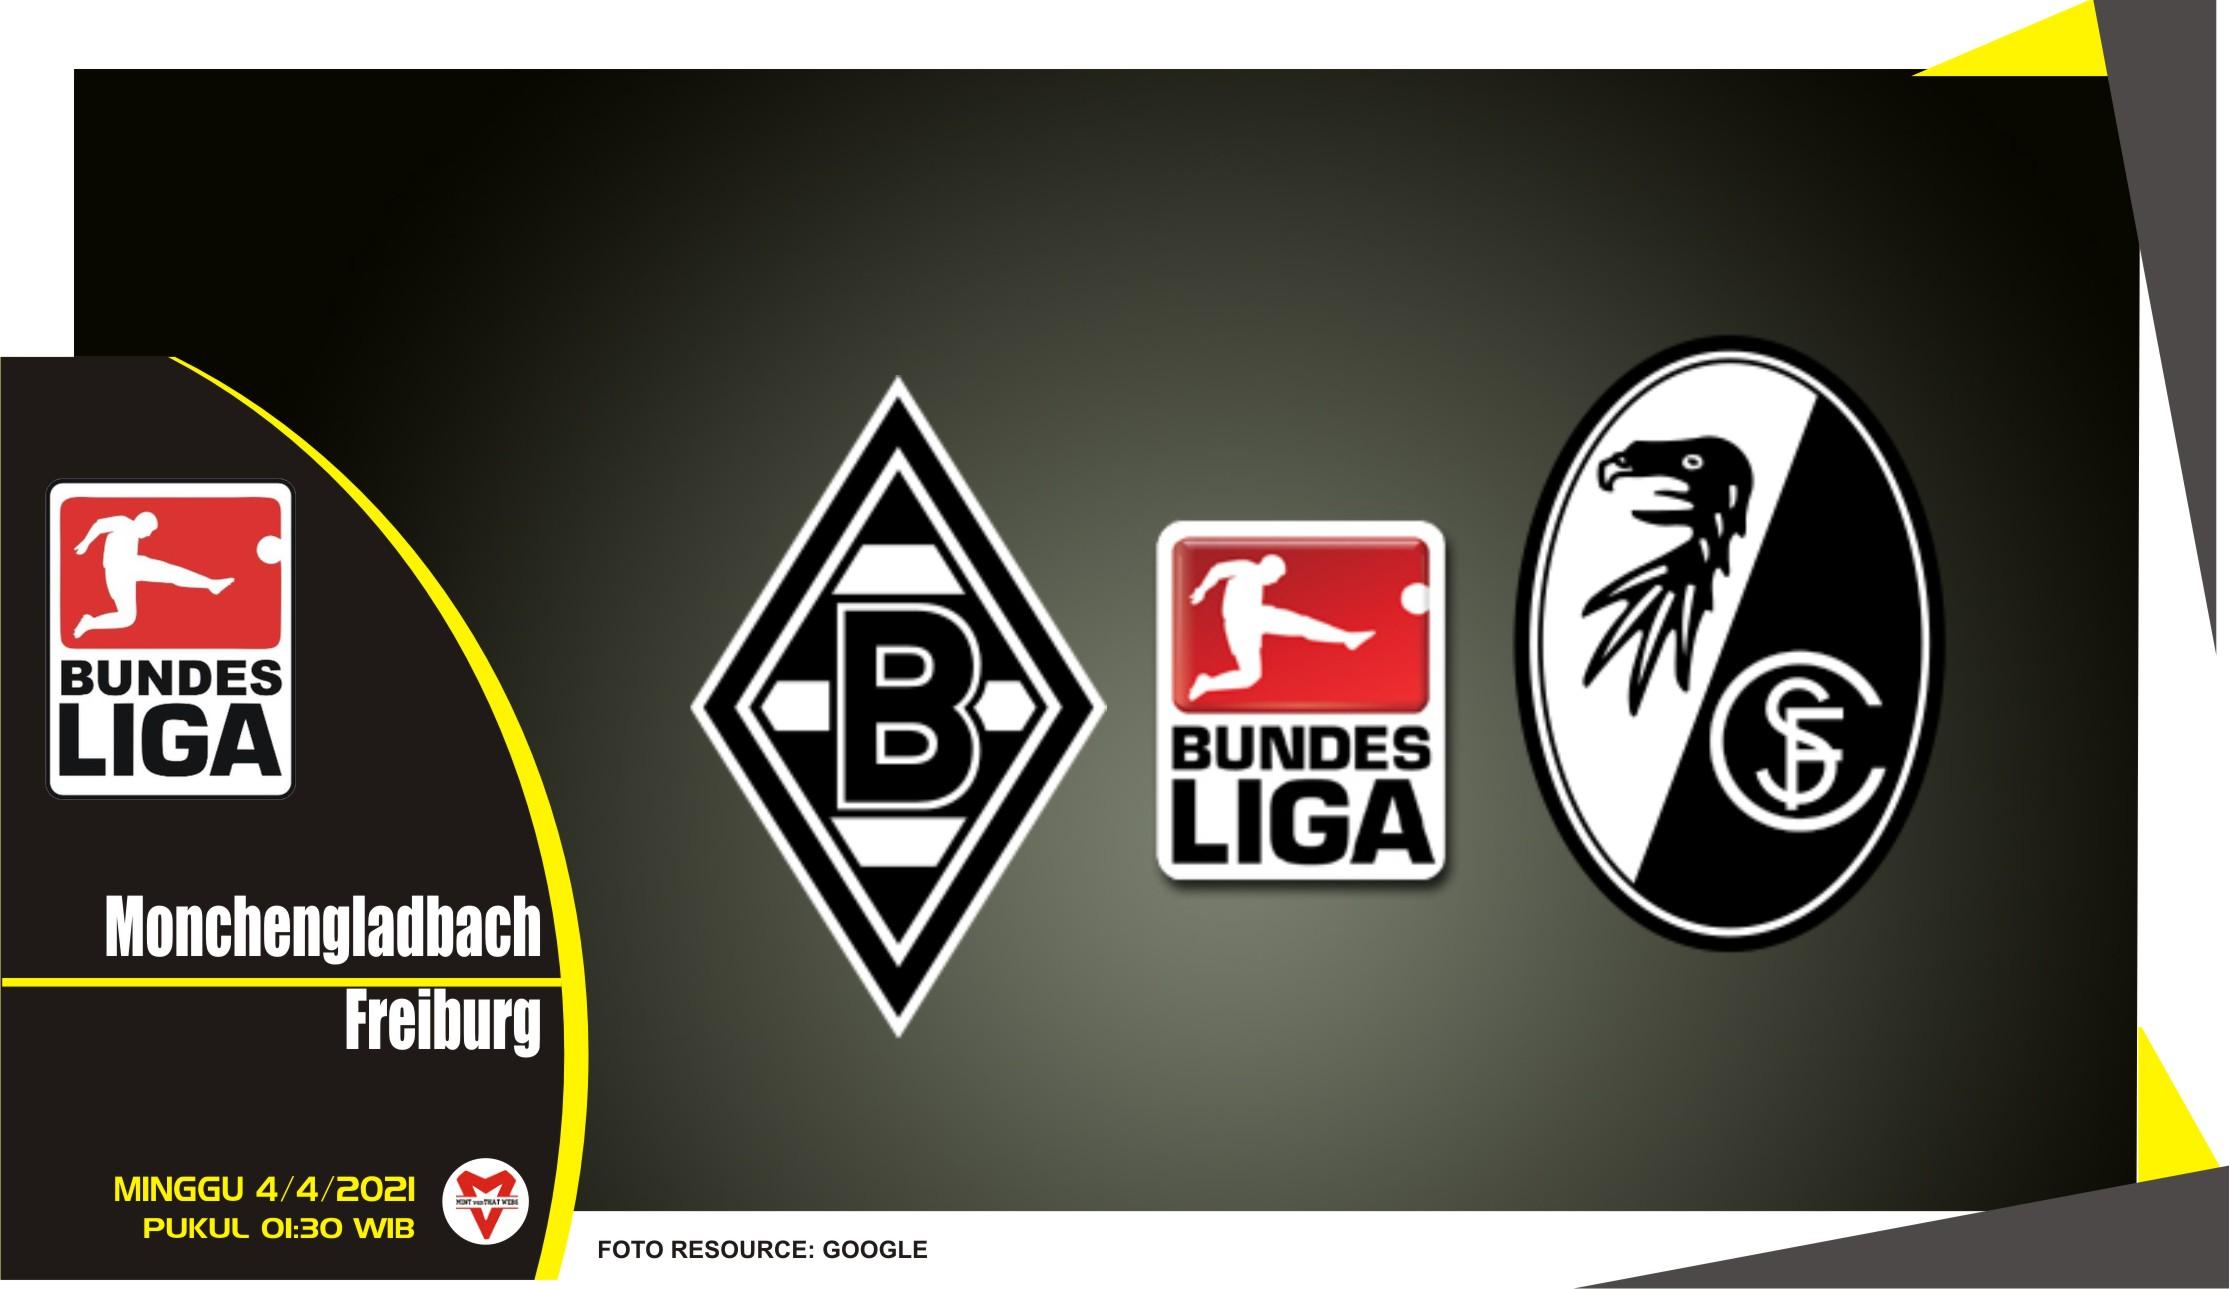 Prediksi Liga Jerman: Monchengladbach vs Freiburg - 4 April 2021